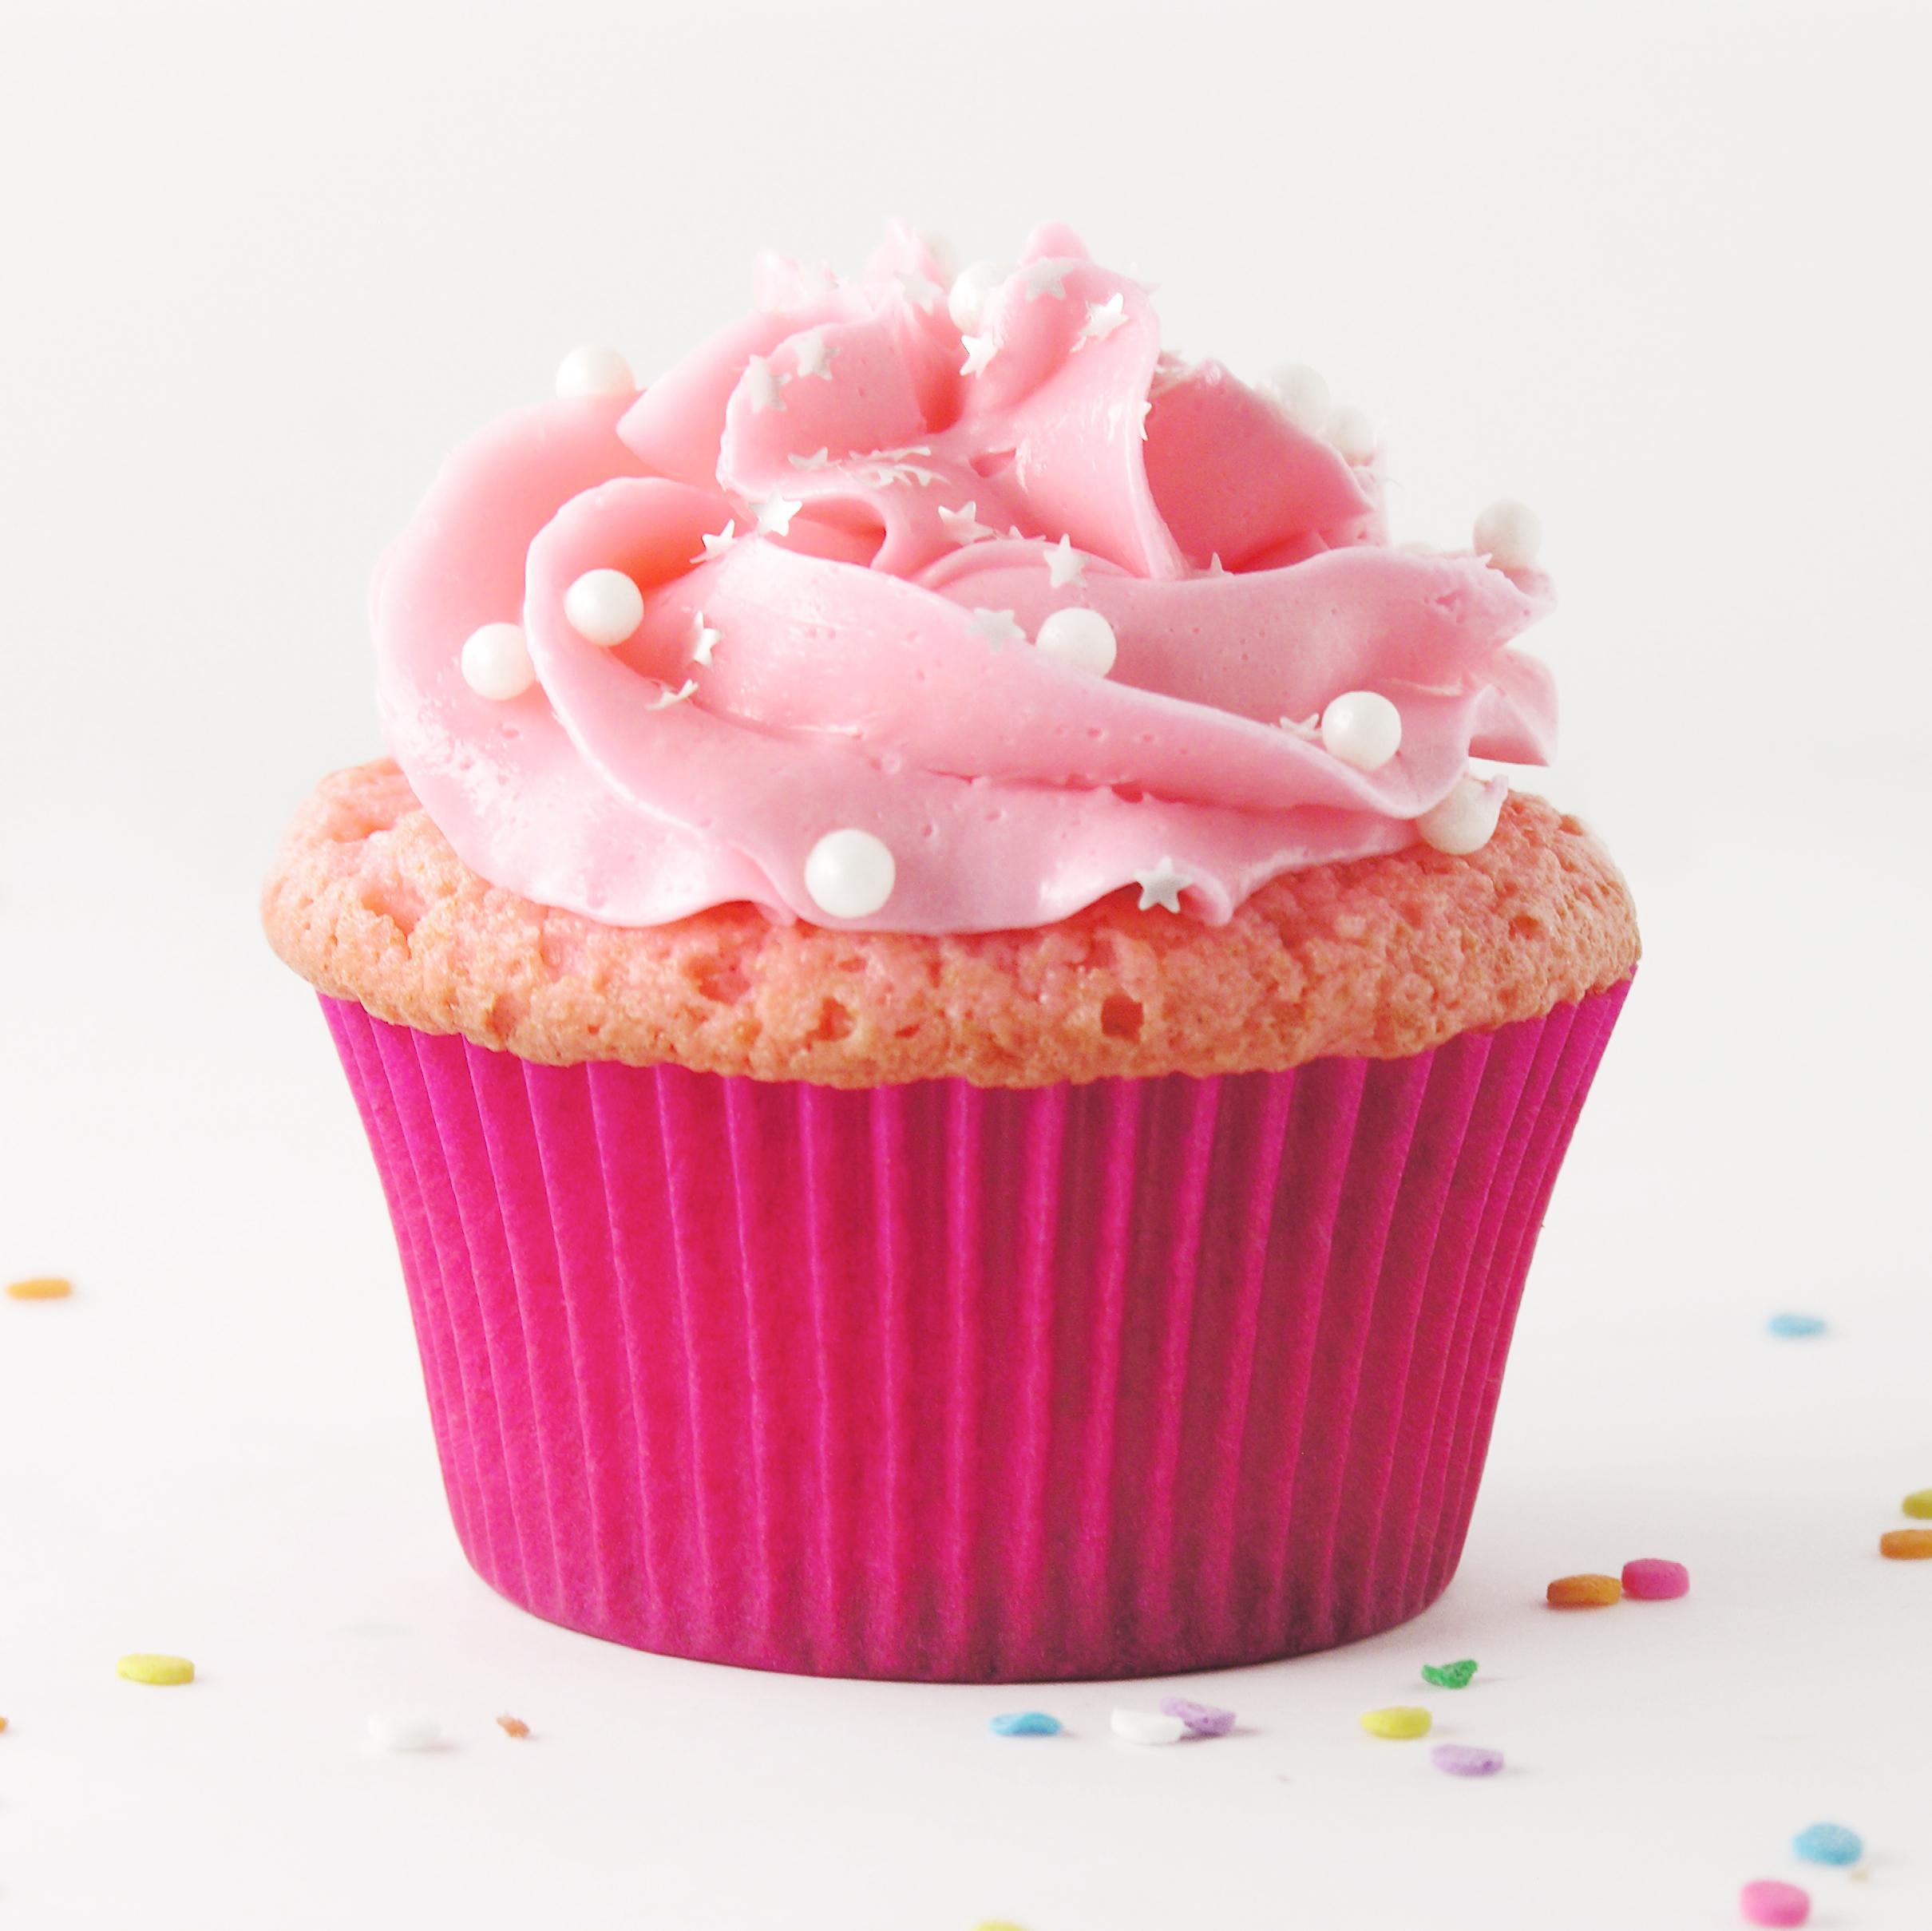 2420x2419 > Cupcake Wallpapers